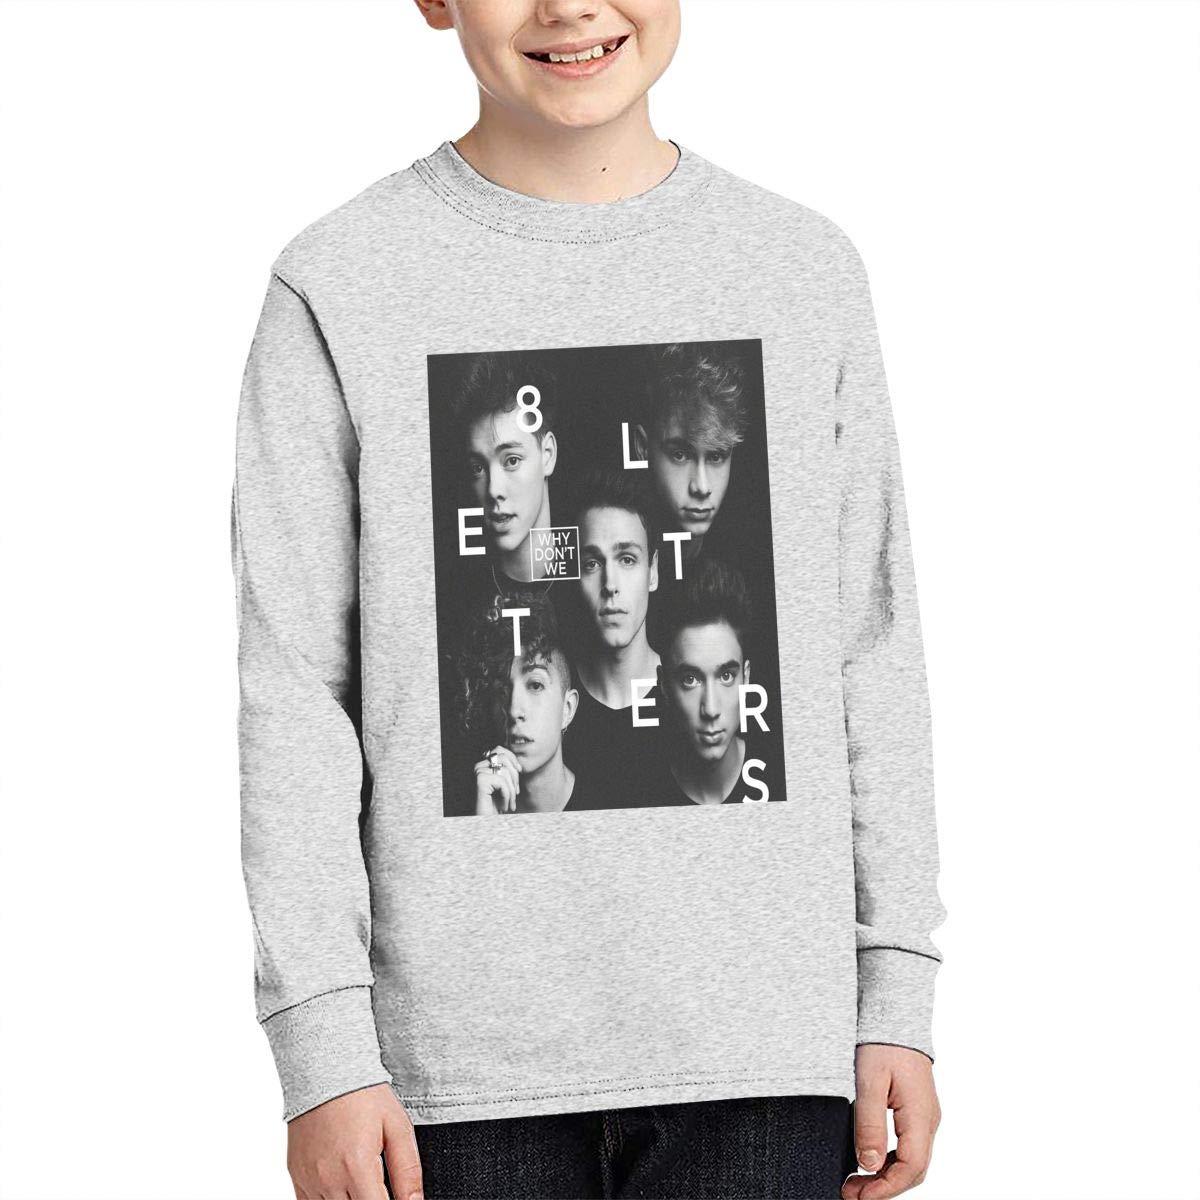 Nvoxklsp Why Dont We Cotton Teen Boys Girls Teenage Tees Shirt